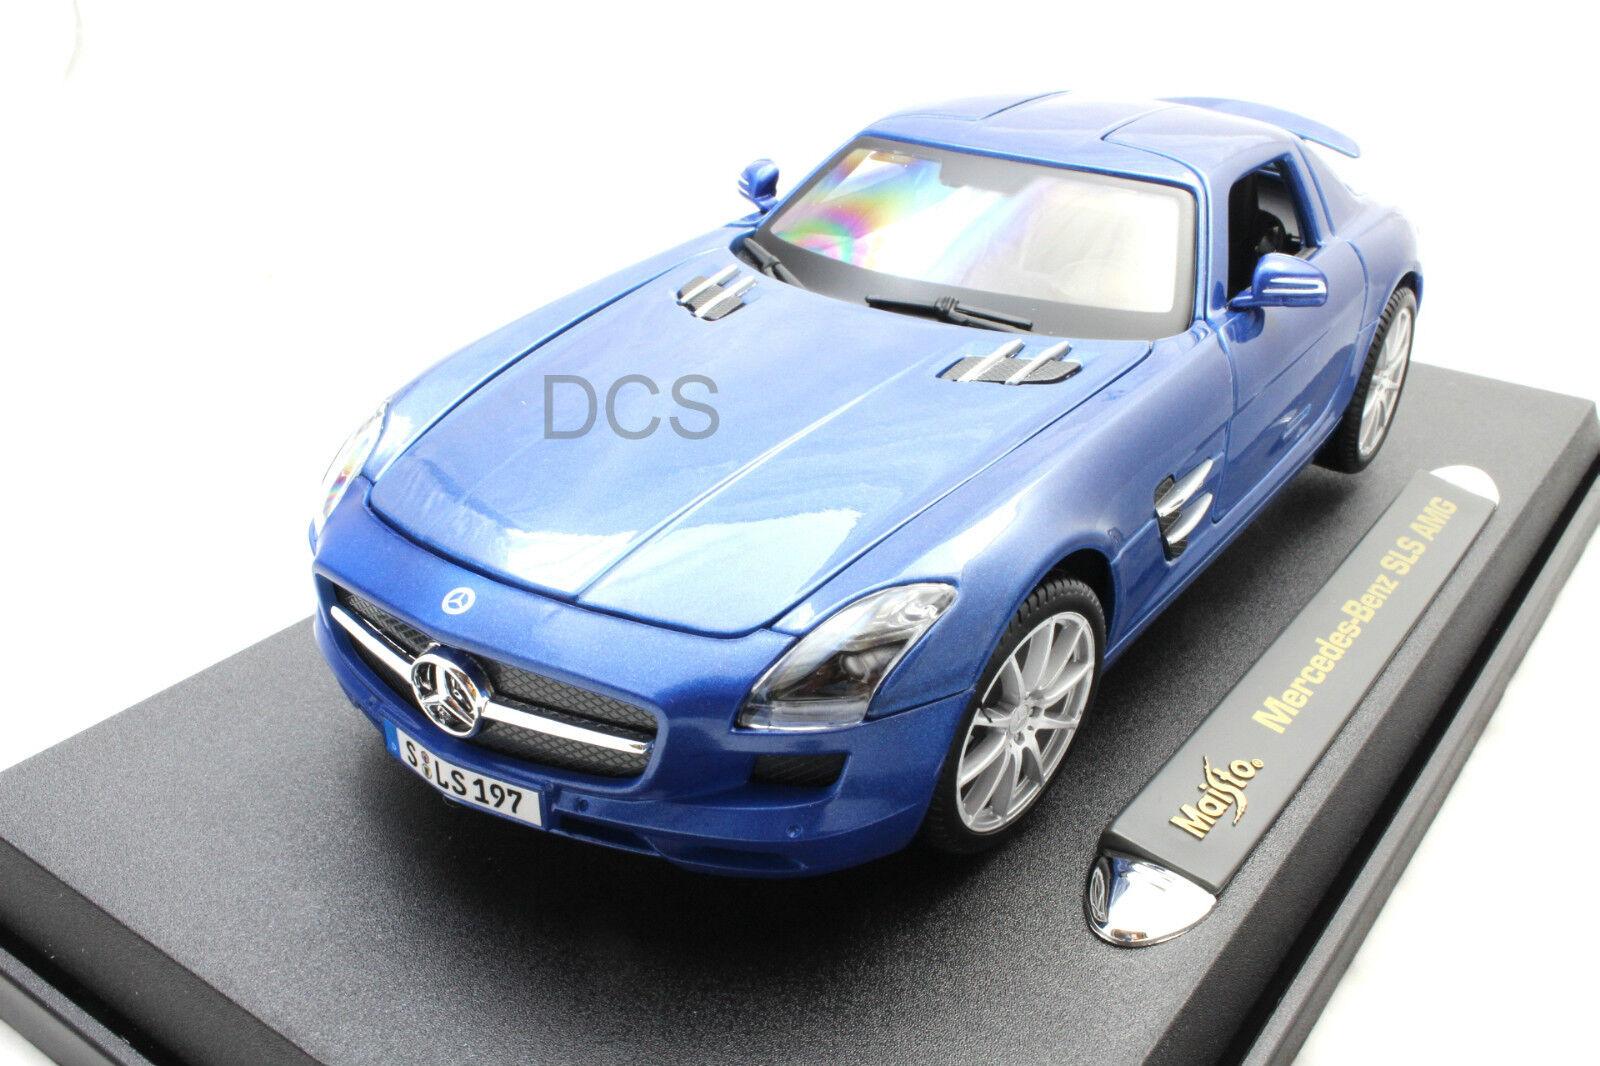 Maisto Mercedes Benz SLS AMG Gullvinge blå 1  18 tärningskast bil